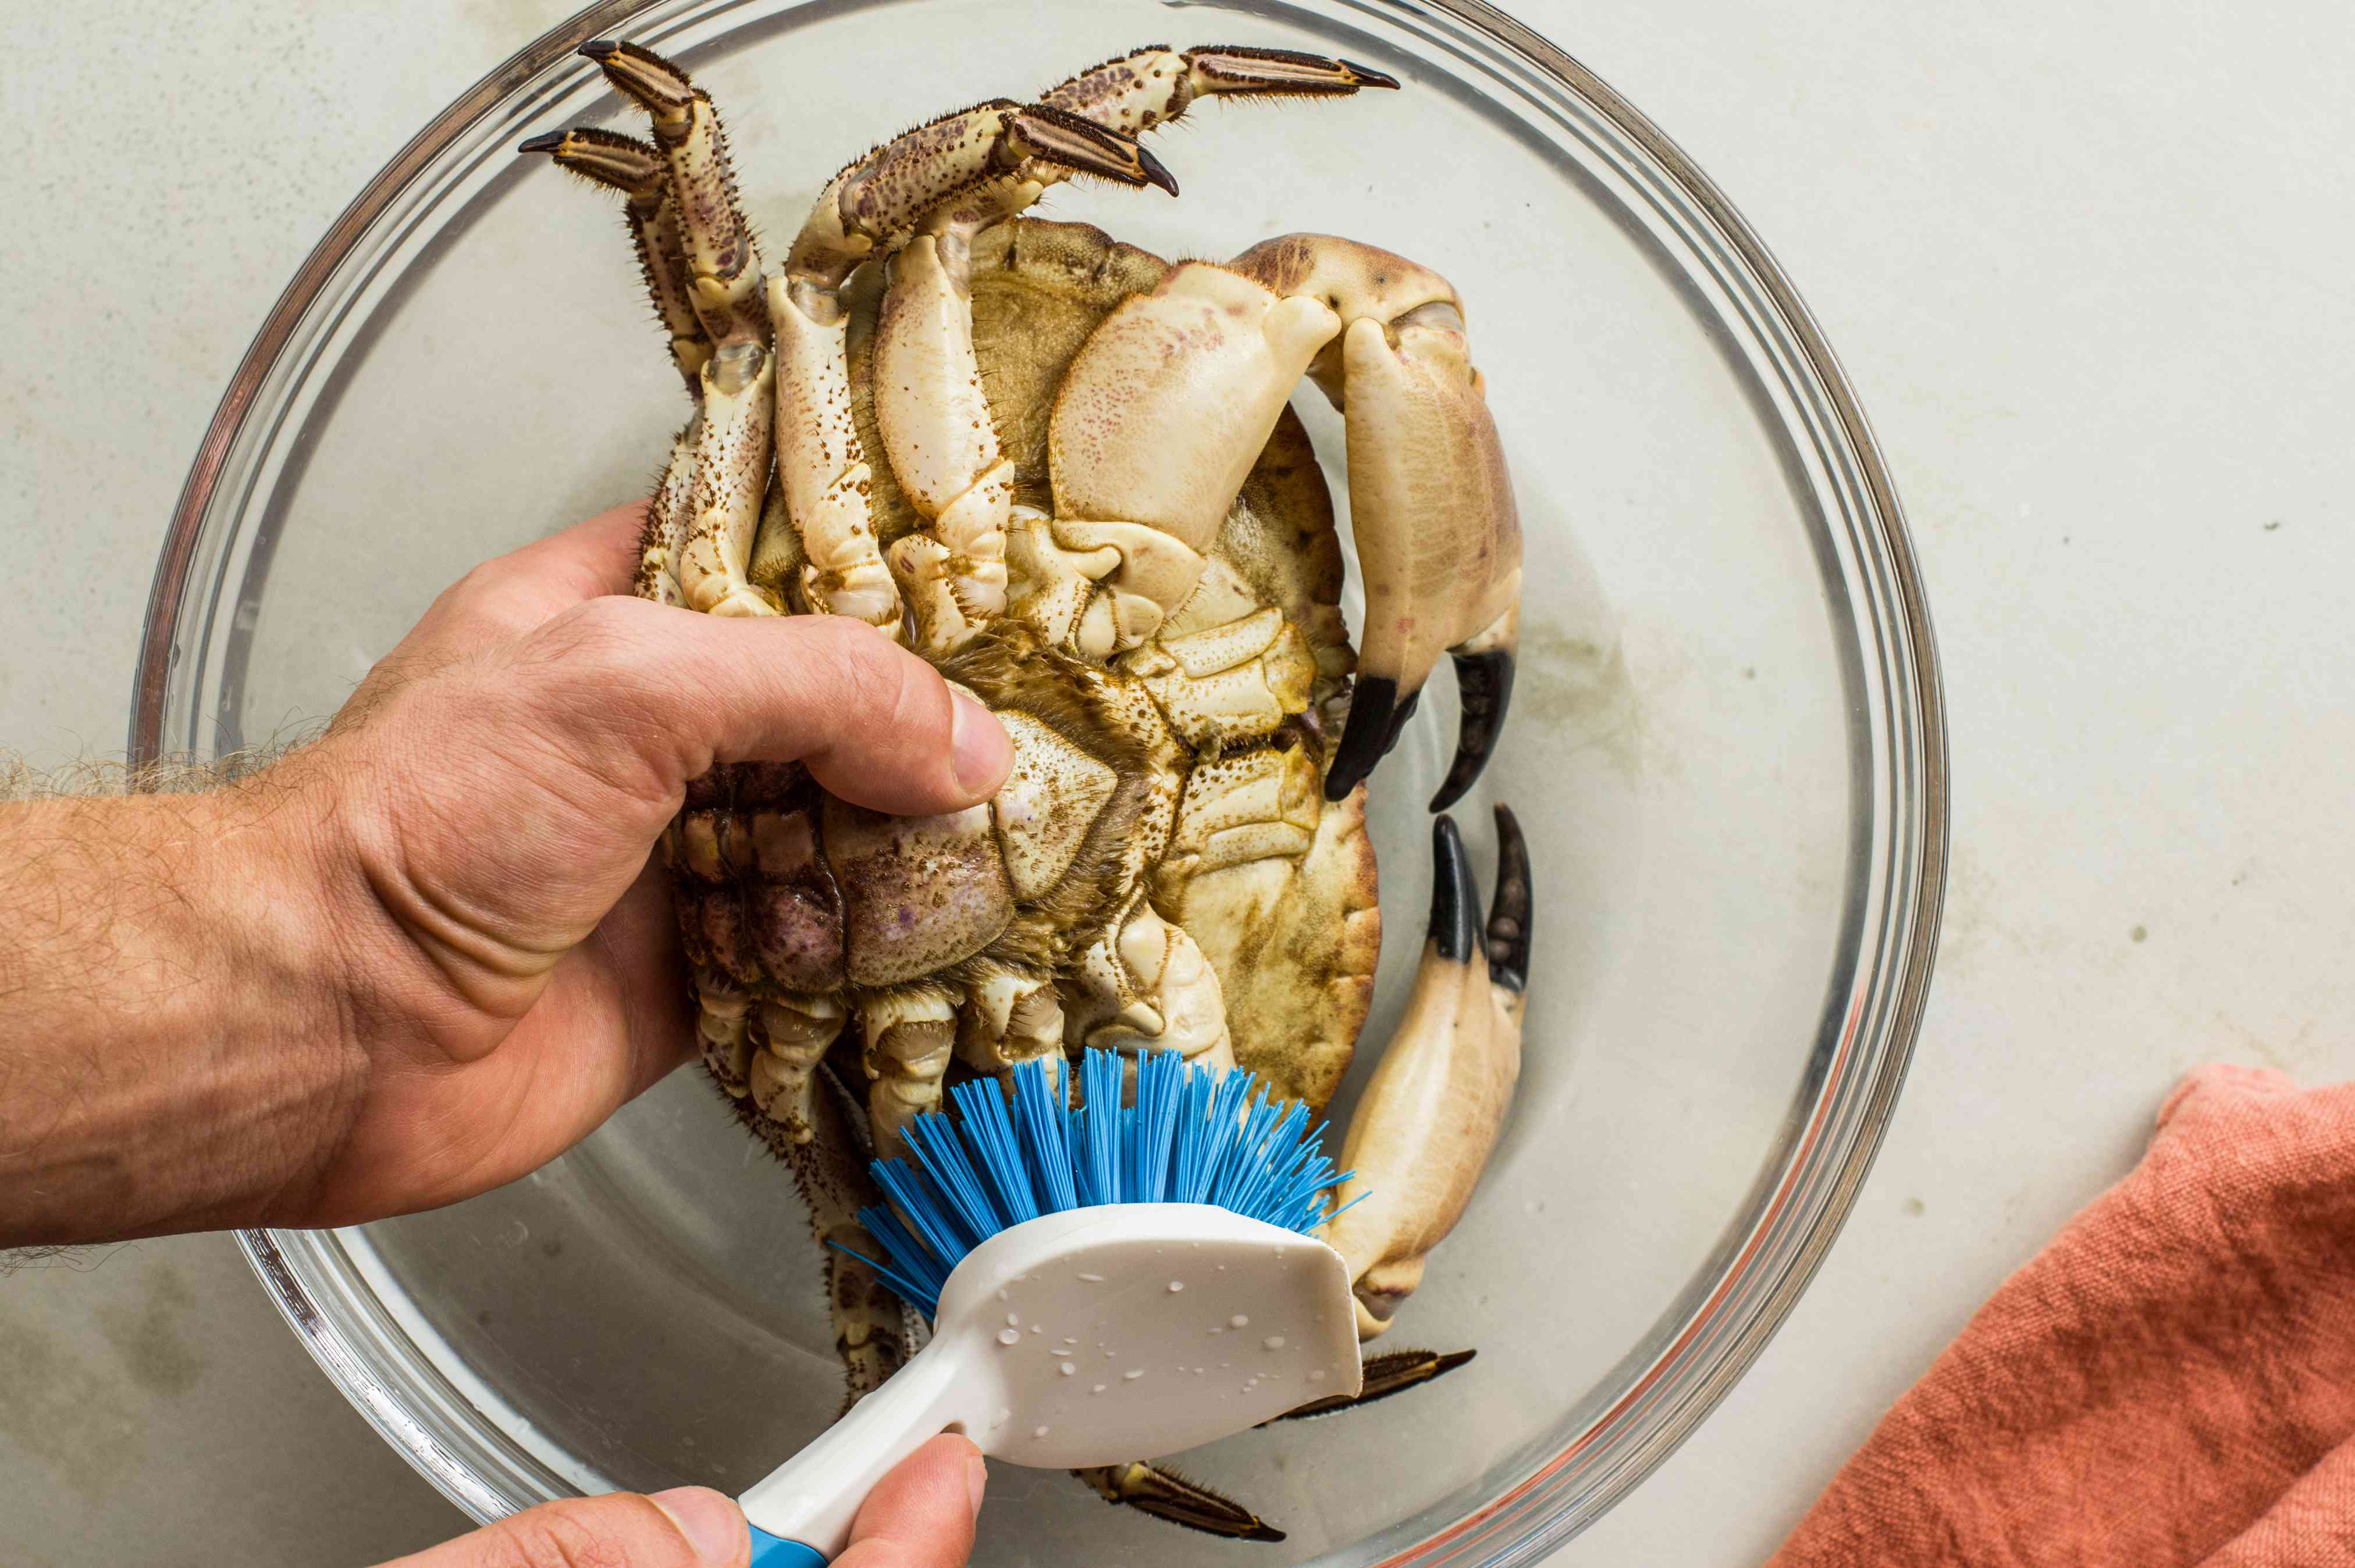 Scrub the crabs